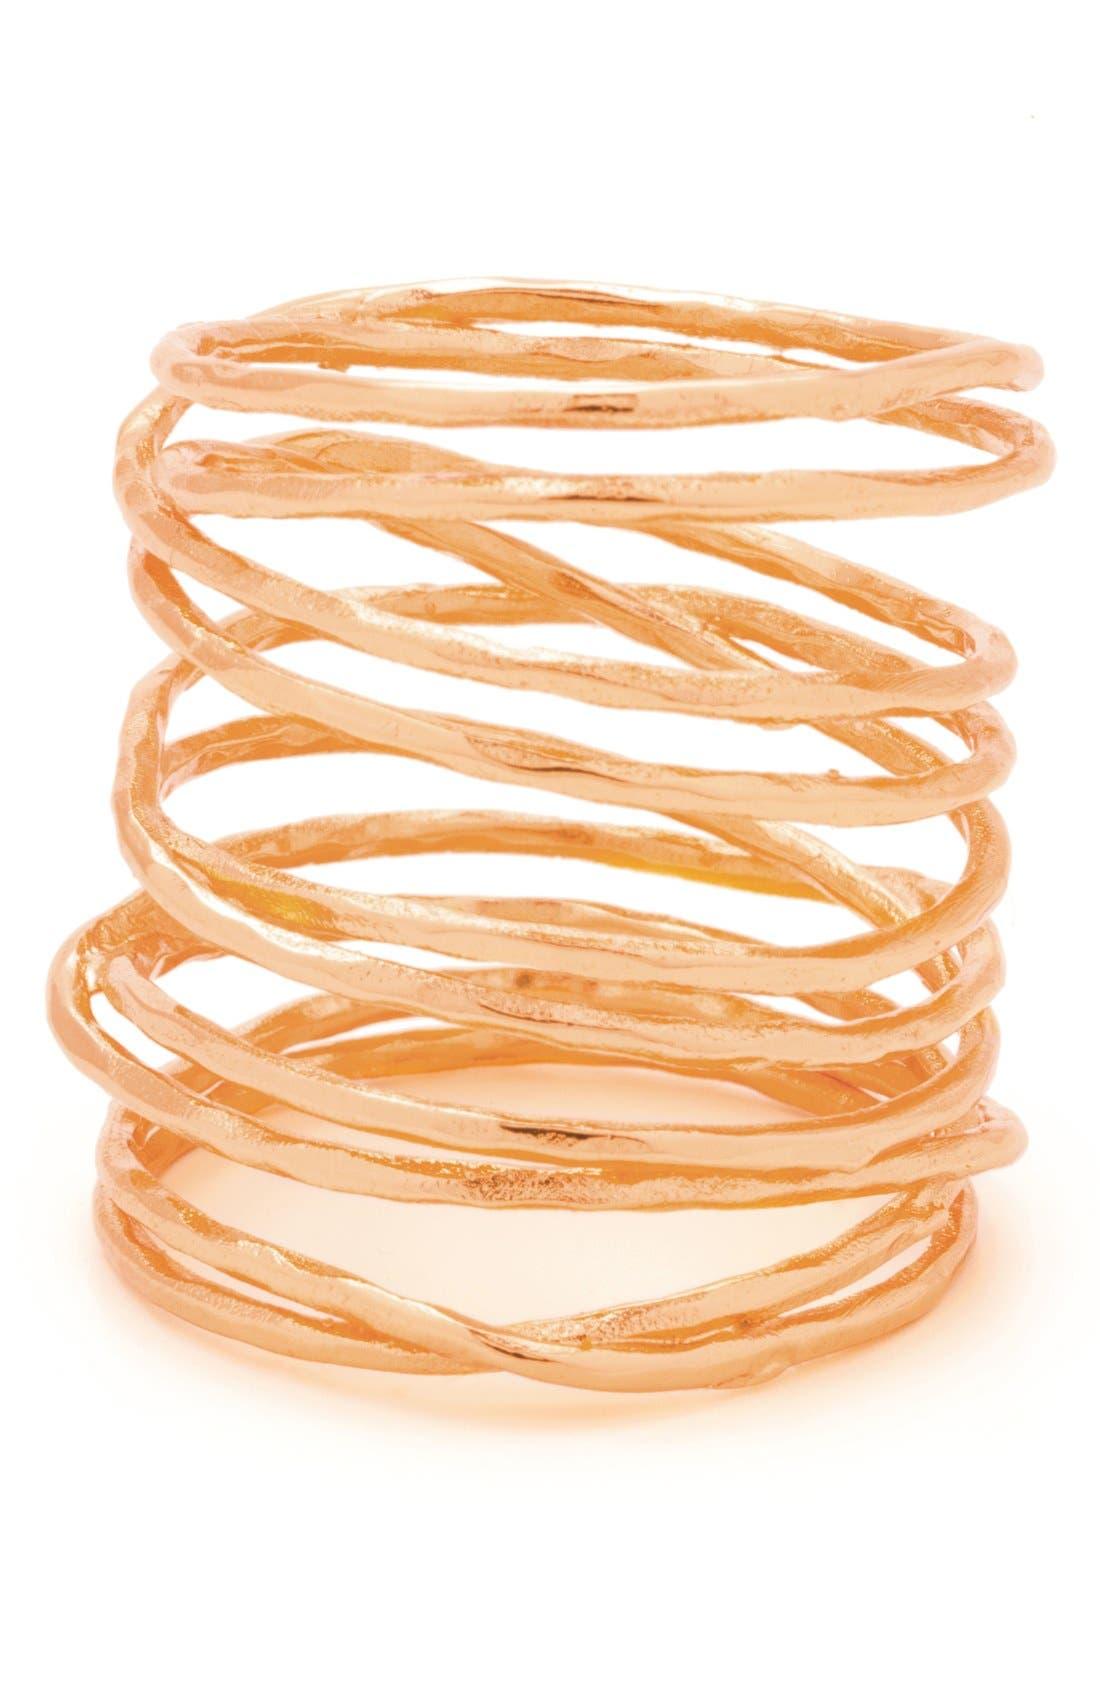 Main Image - gorjana 'Lola' Coil Ring